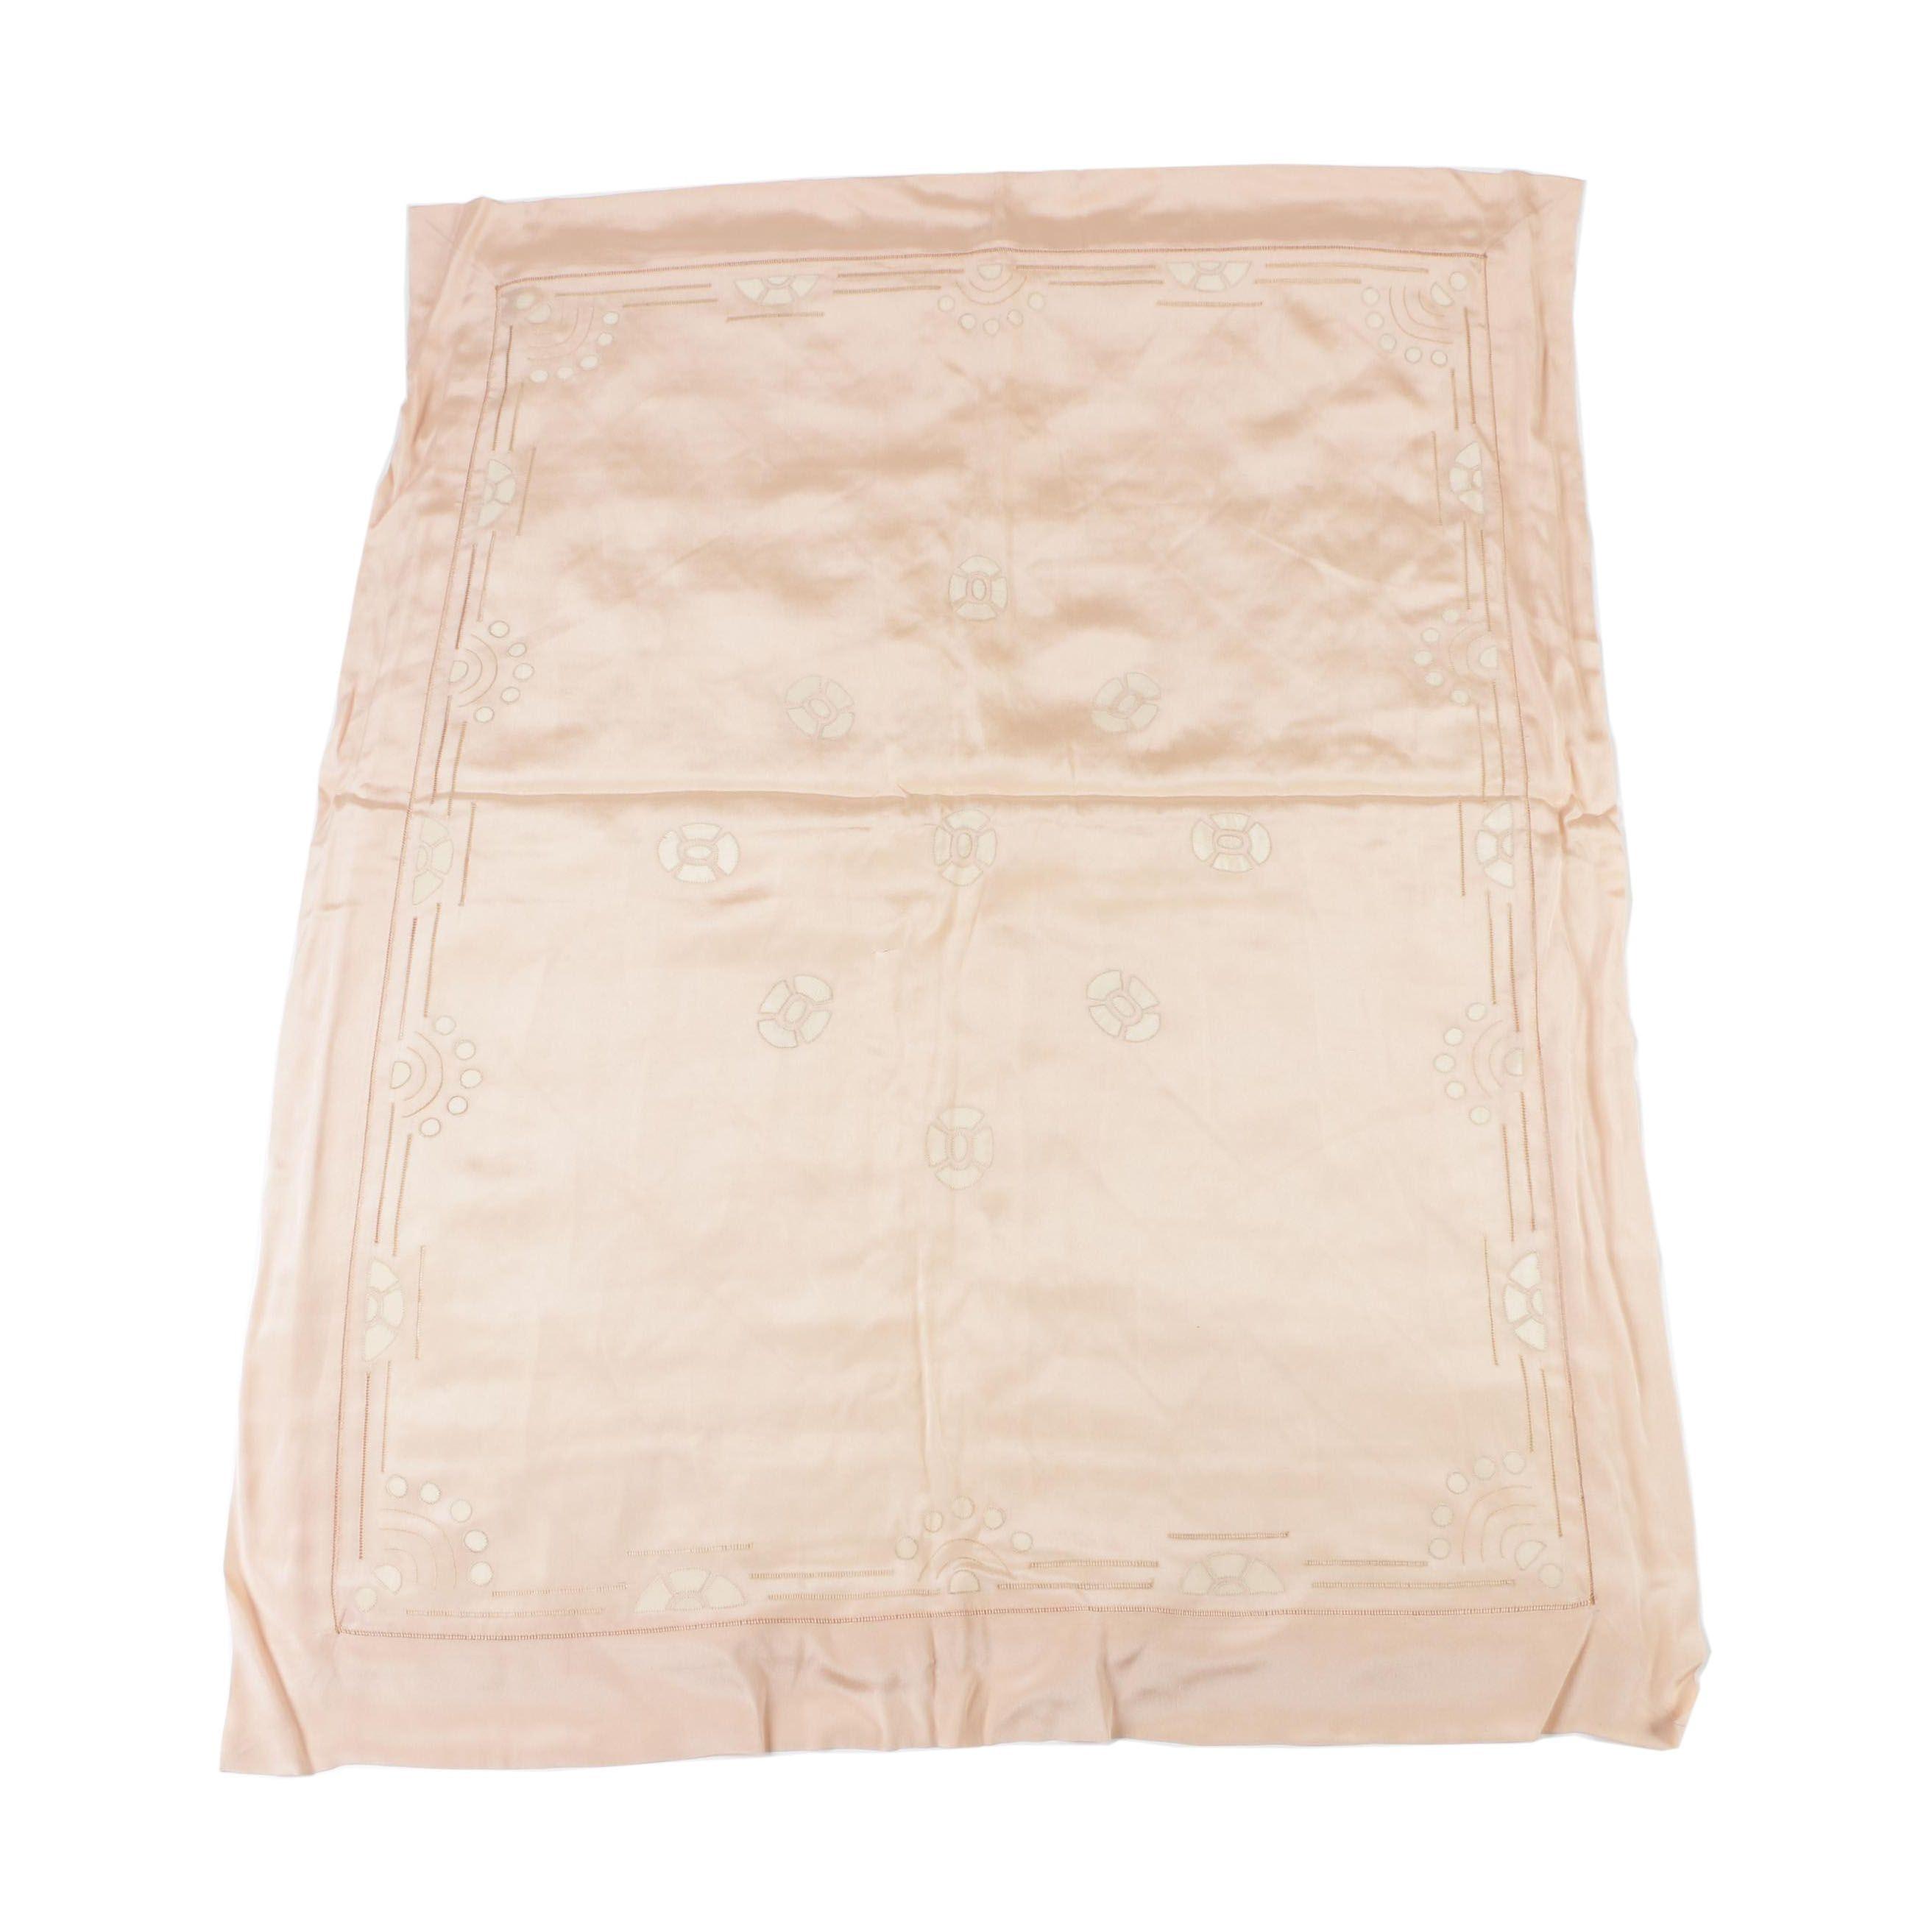 Maison Rouff Paris Peach Silk Appliqued Pram Blanket Cover, circa 1920